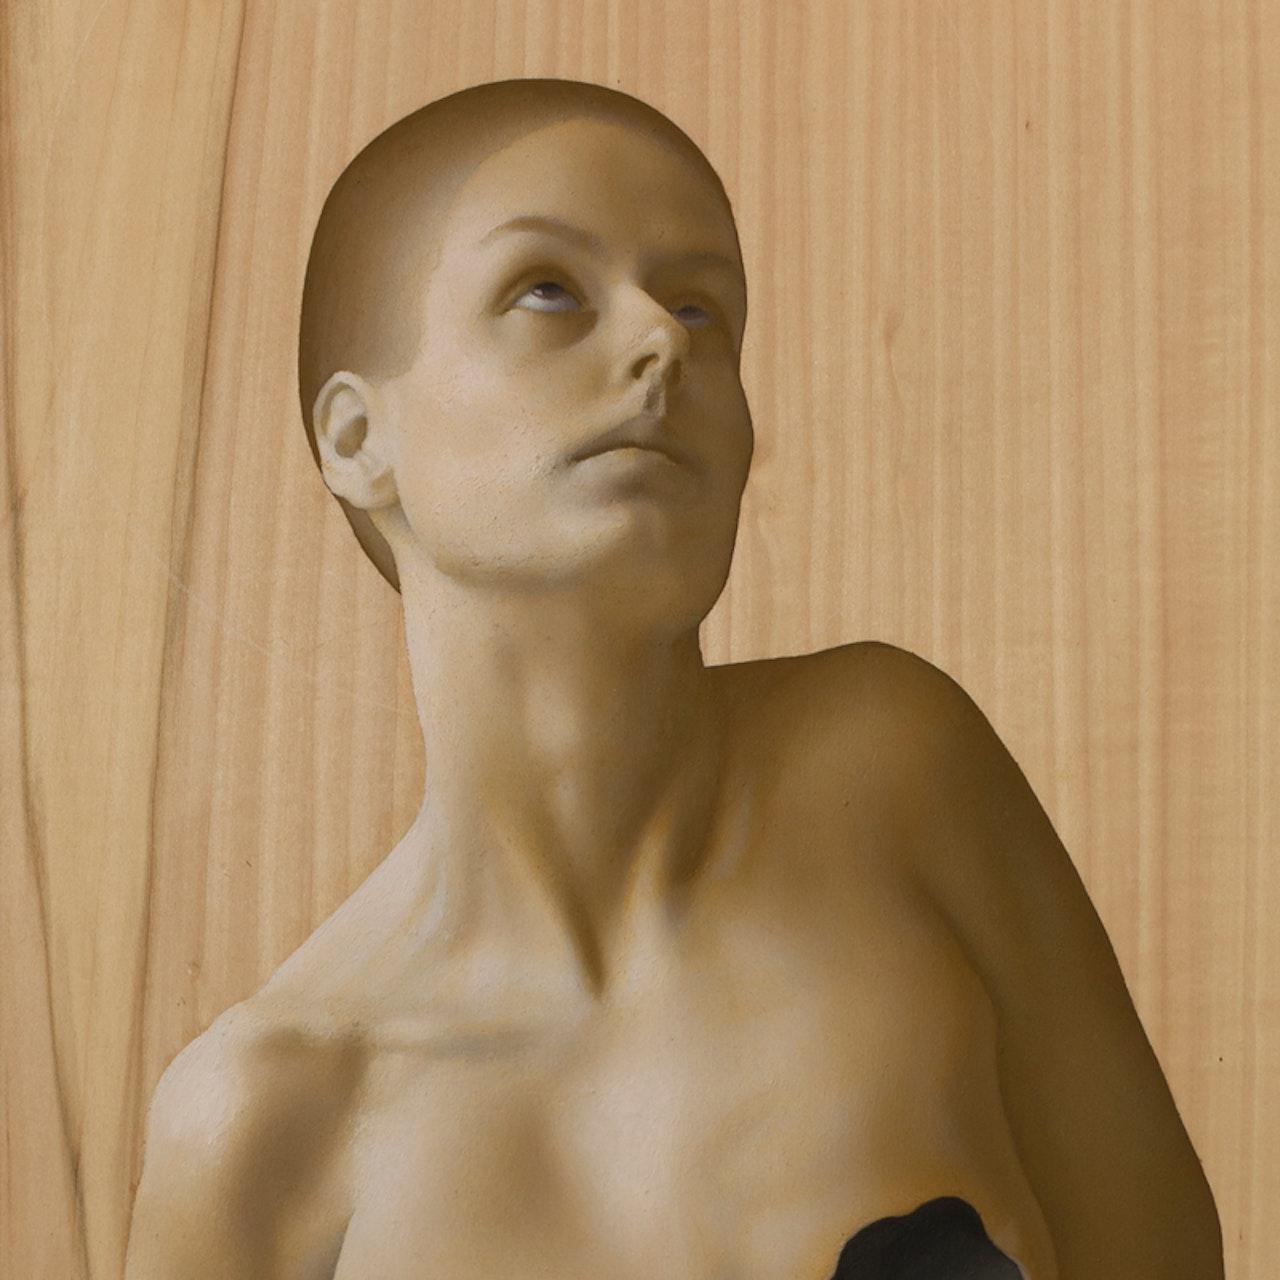 St. Agatha with breast cut off